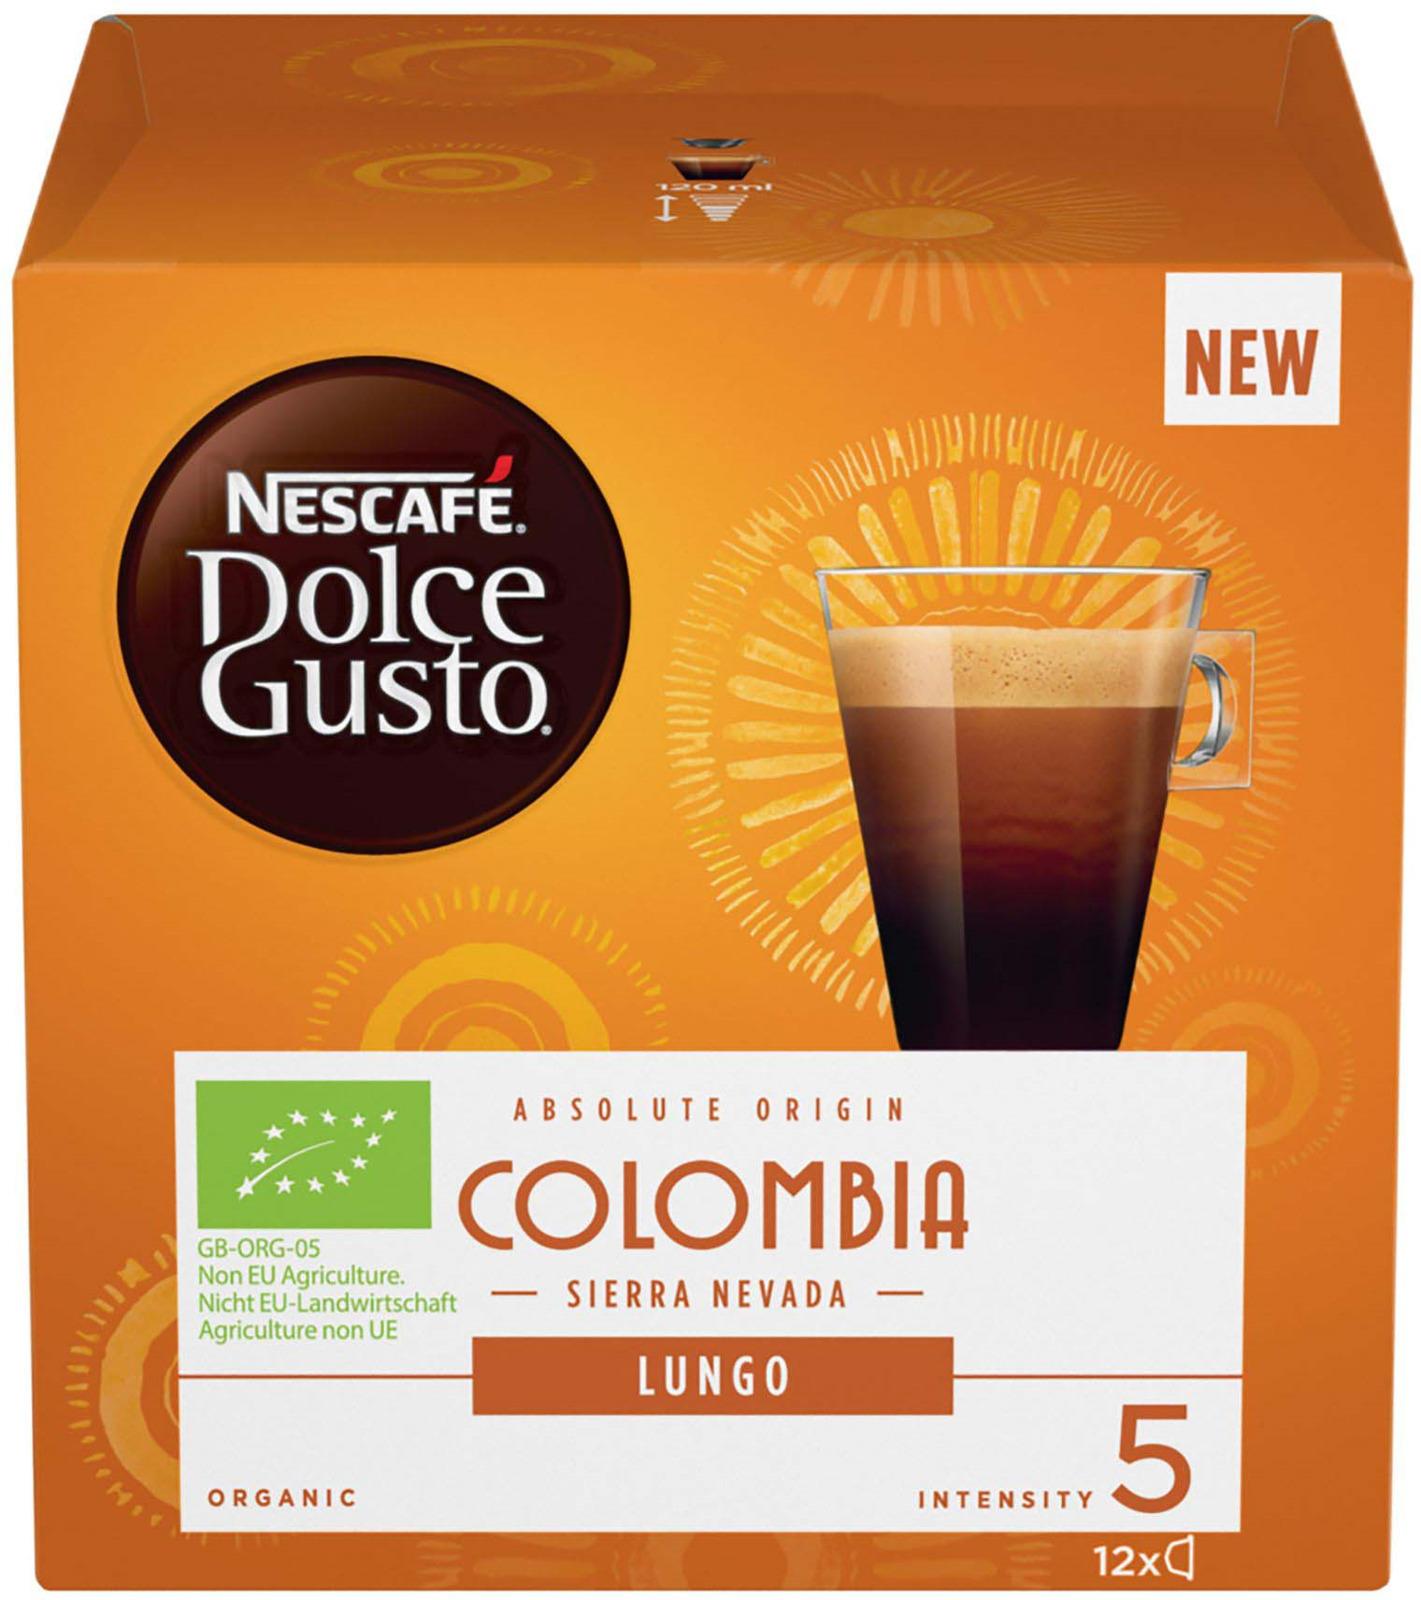 Nescafe Dolce Gusto Лунго Колумбия кофе в капсулах, 12 шт кофемашина капсульная krups kp 1208 10 mini me nescafe dolce gusto